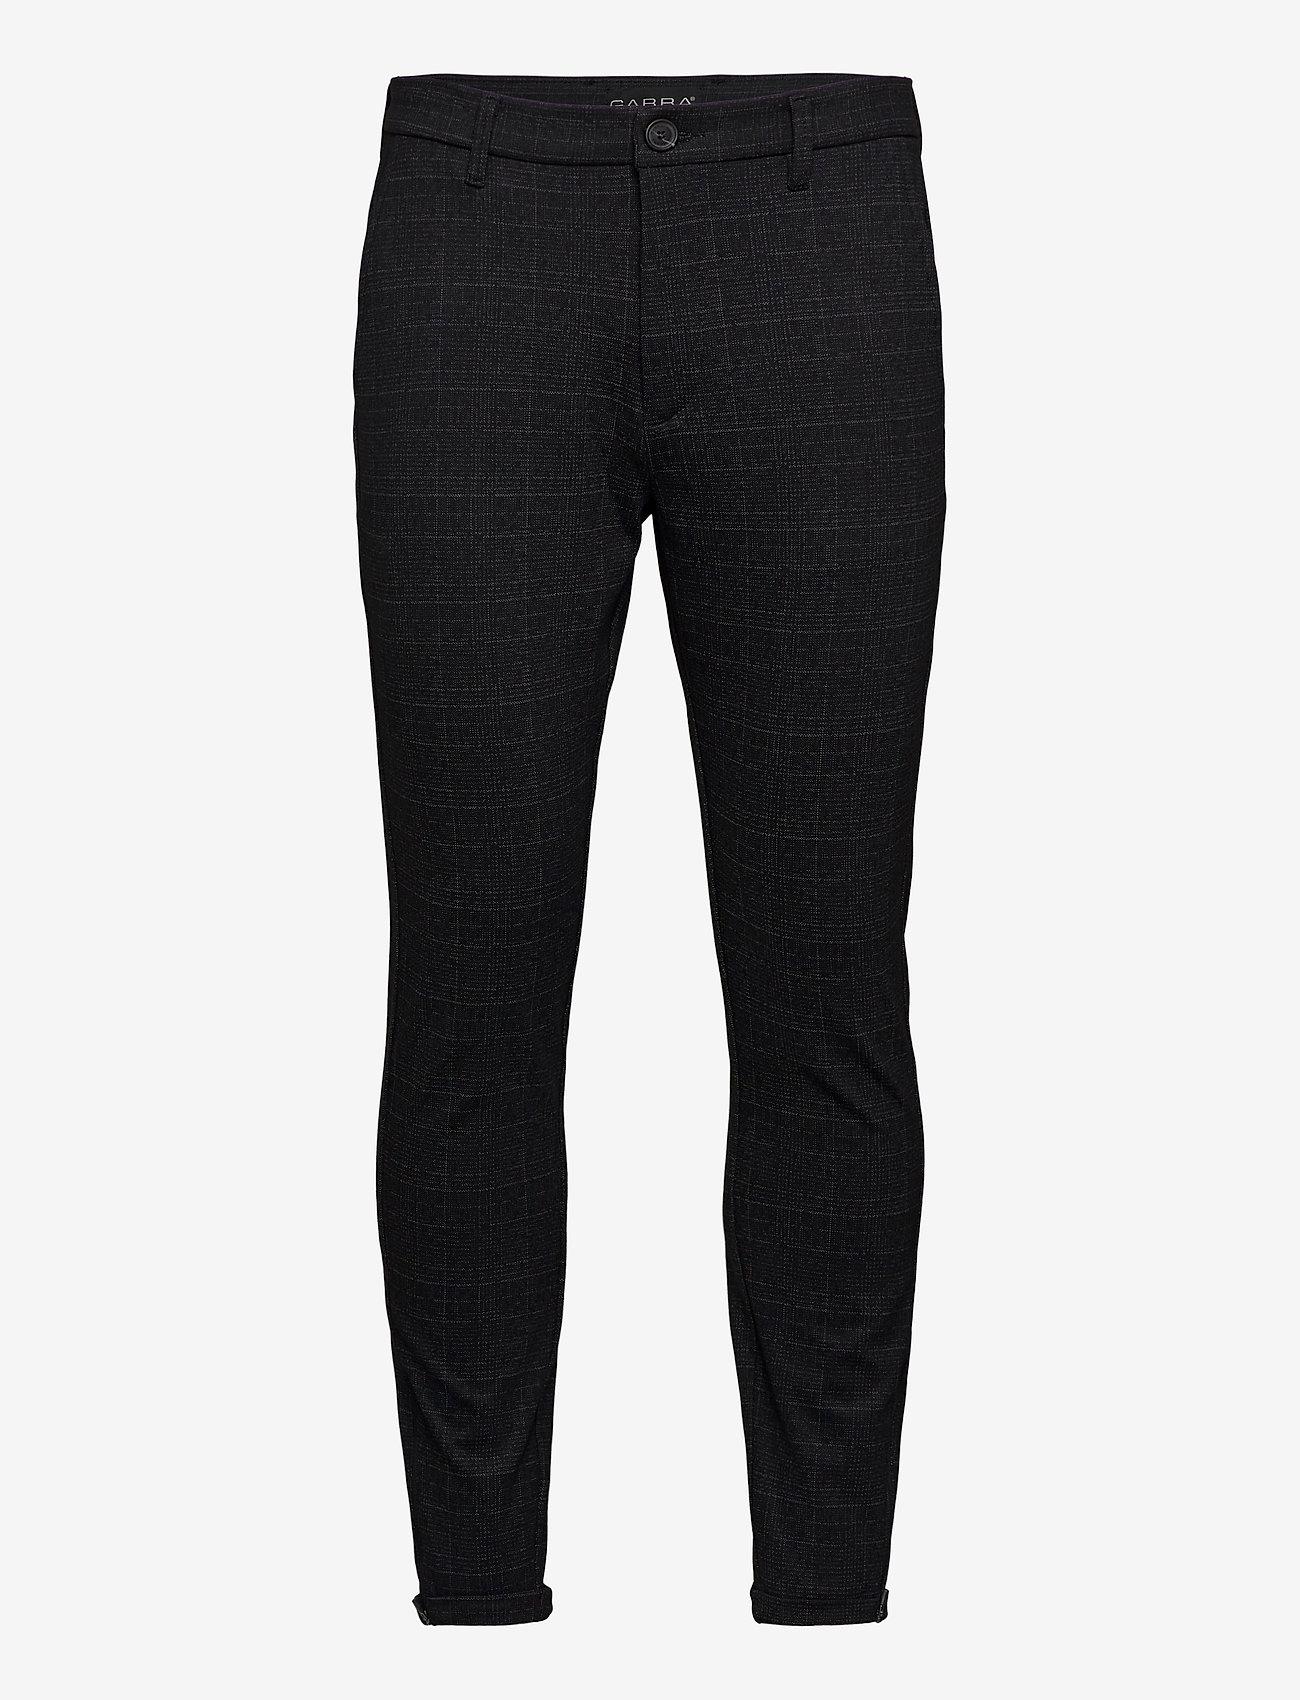 Gabba - Pisa KD3920 Black Shadow Check Pant - chinos - black check - 0